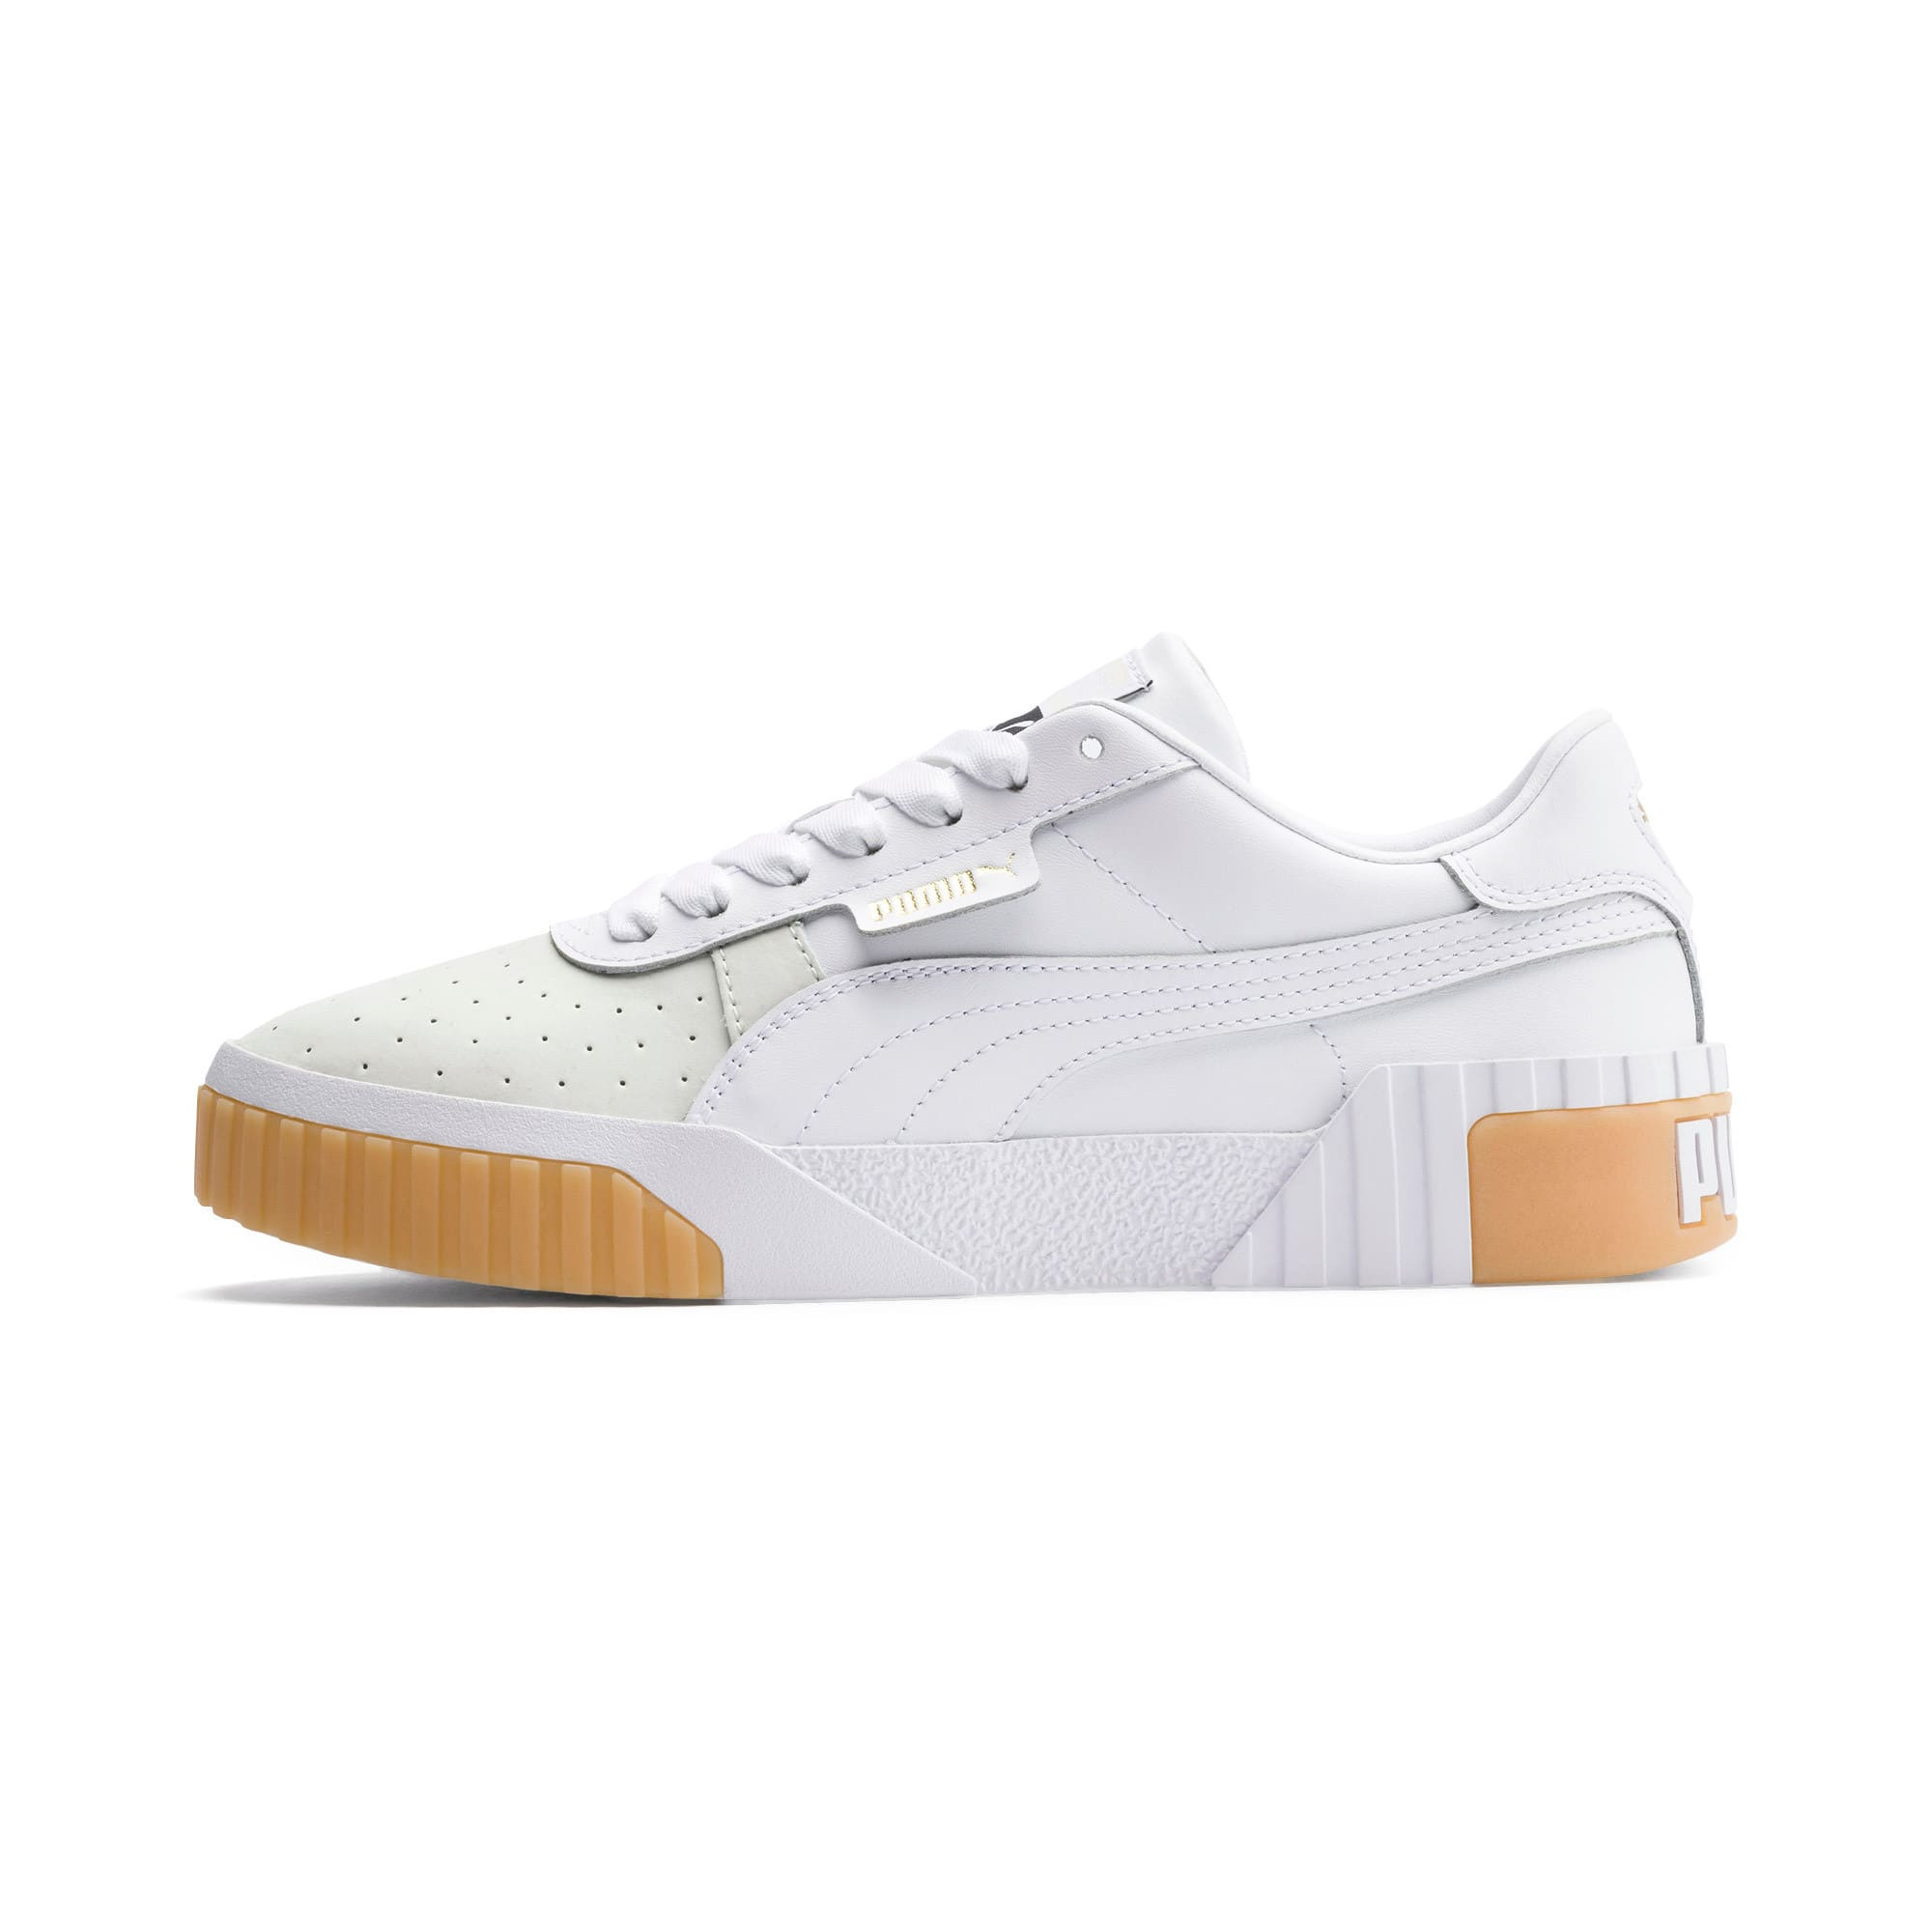 Thumbnail 1 of Cali Exotic Damen Sneaker, Puma White-Puma White, medium